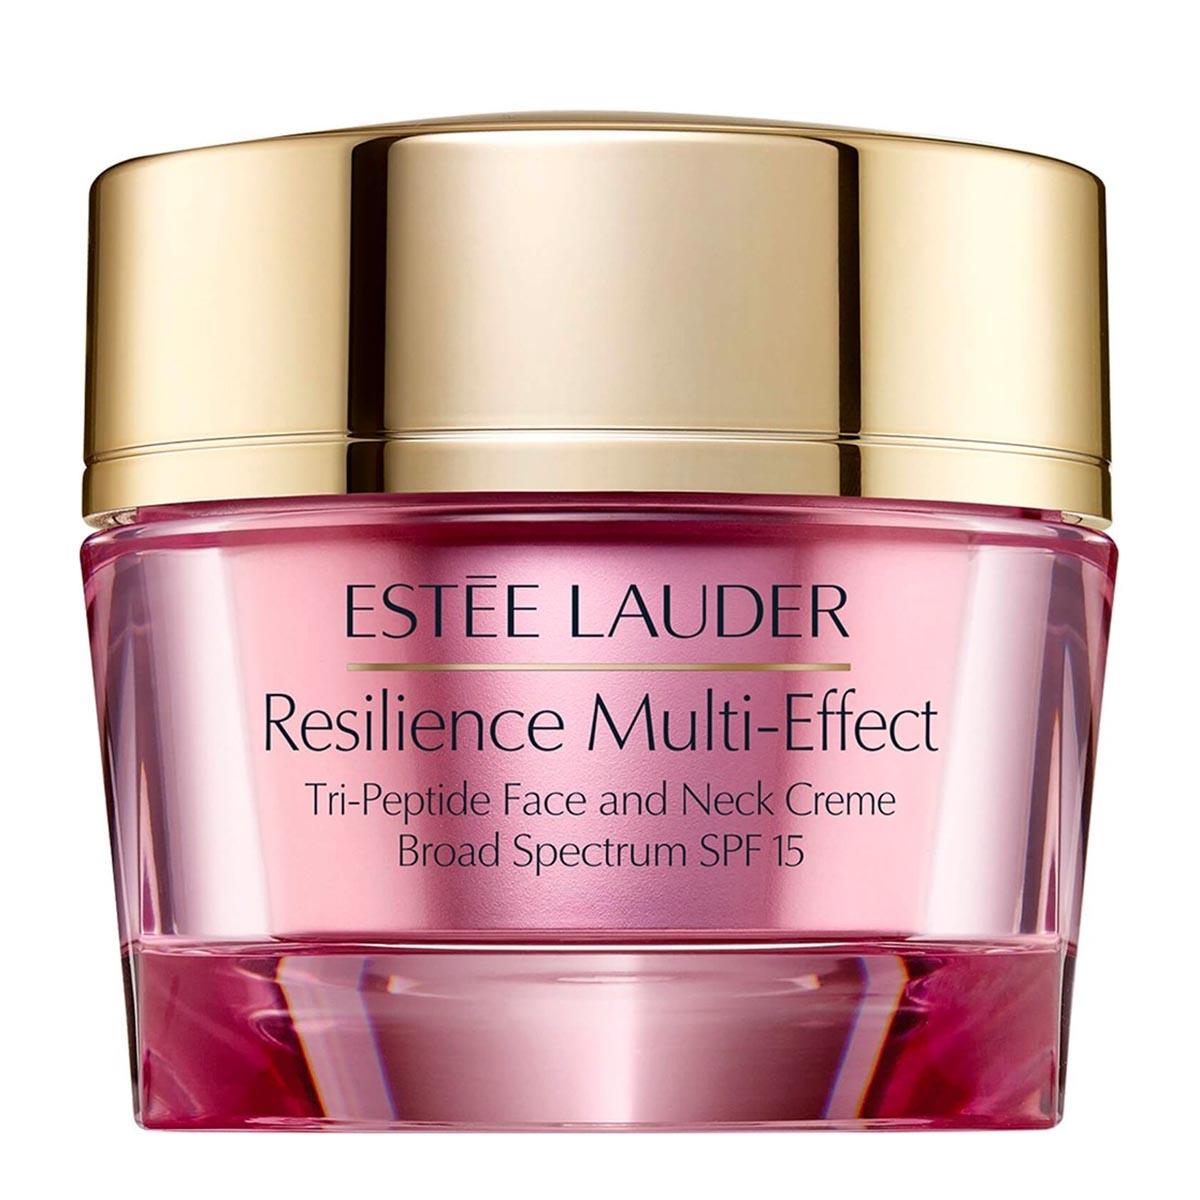 Estee lauder resilence lift piel normal a media crema 50ml